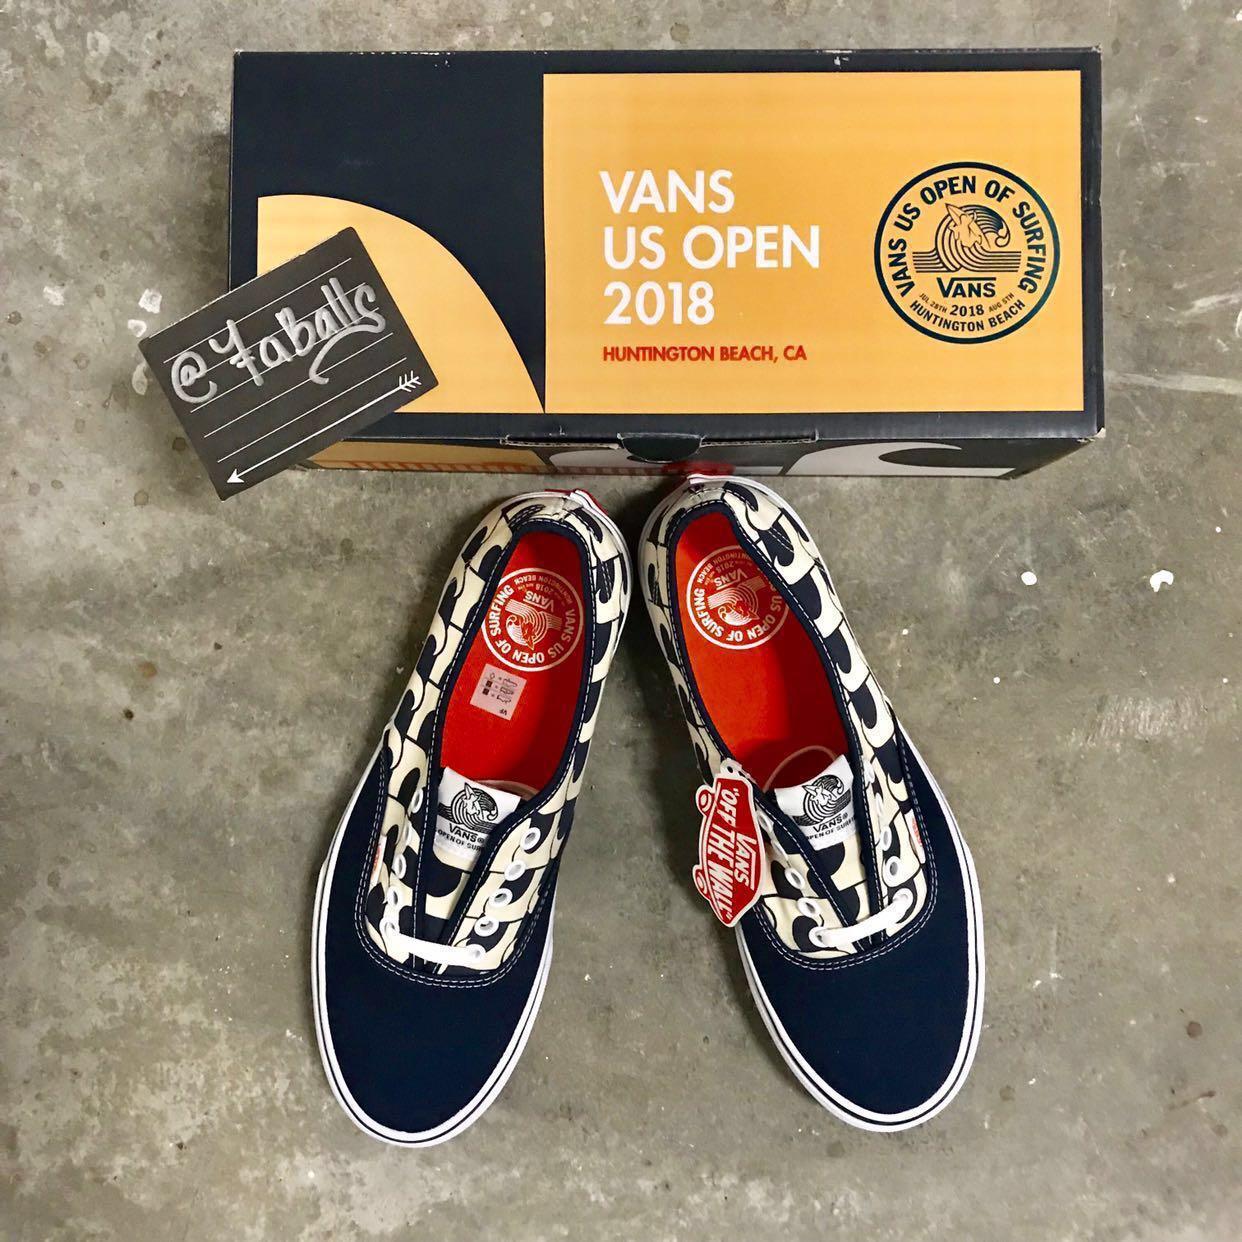 d29a81ca4a Vans US Open 2018 (Navy Waves) (Authentic)